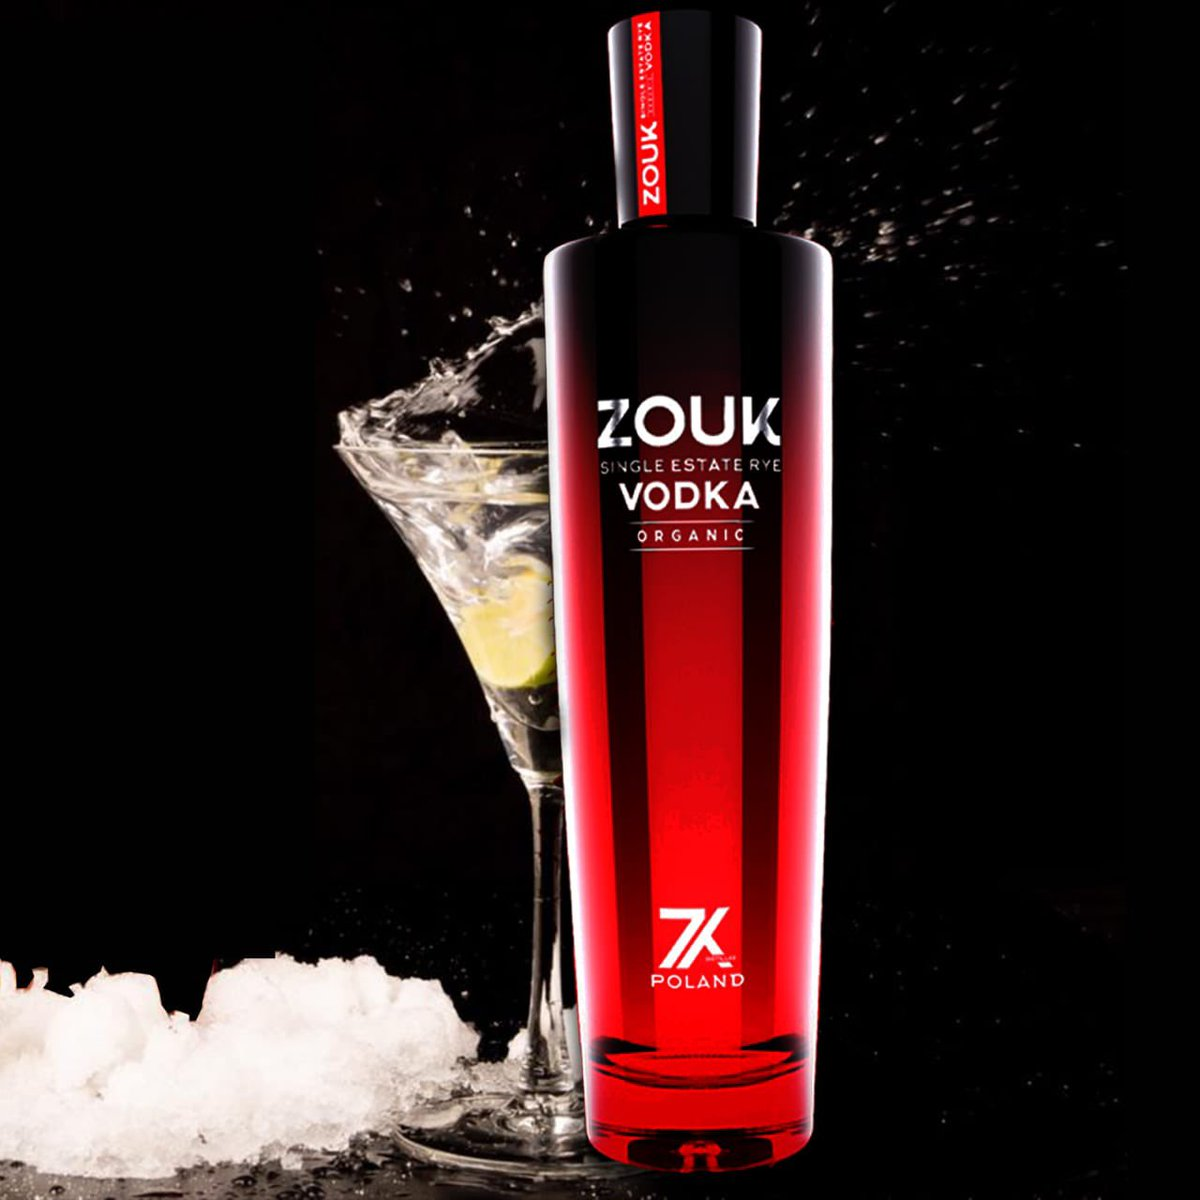 Happy Monday Folks!   Enjoy Zouk Vodka and Chill out ✌🏻🍸  #zoukvodka #vodkamonday #happyvibes #mondaymood #mondayvibes